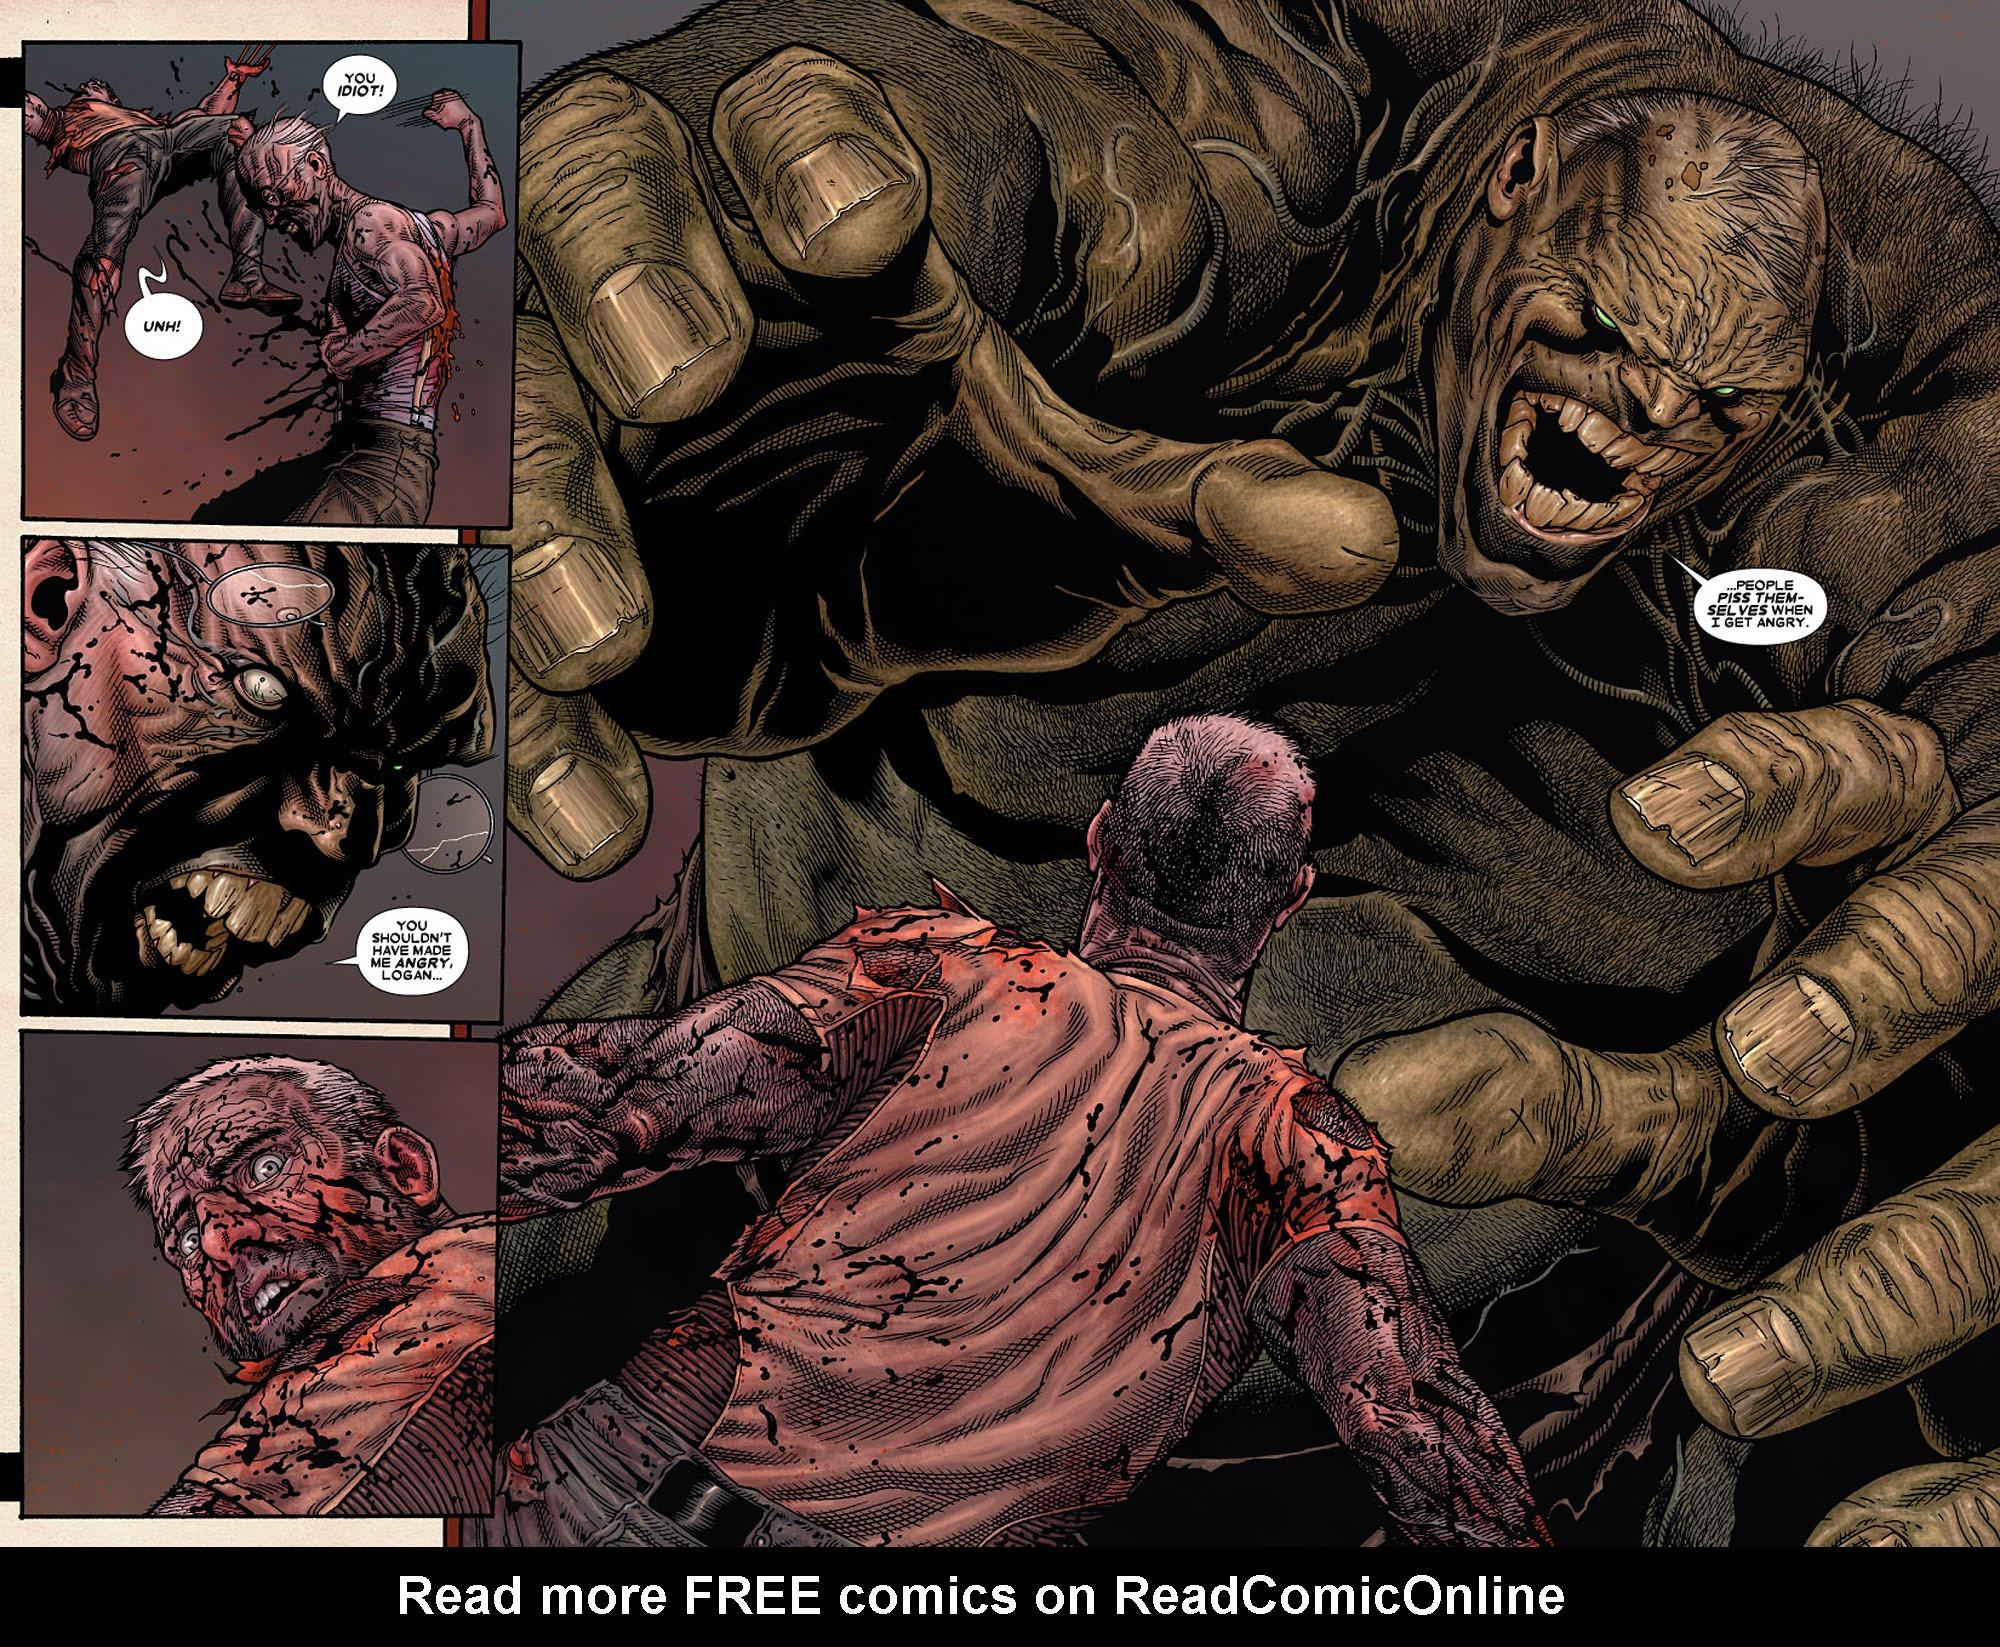 Read online Wolverine: Old Man Logan comic -  Issue # Full - 185